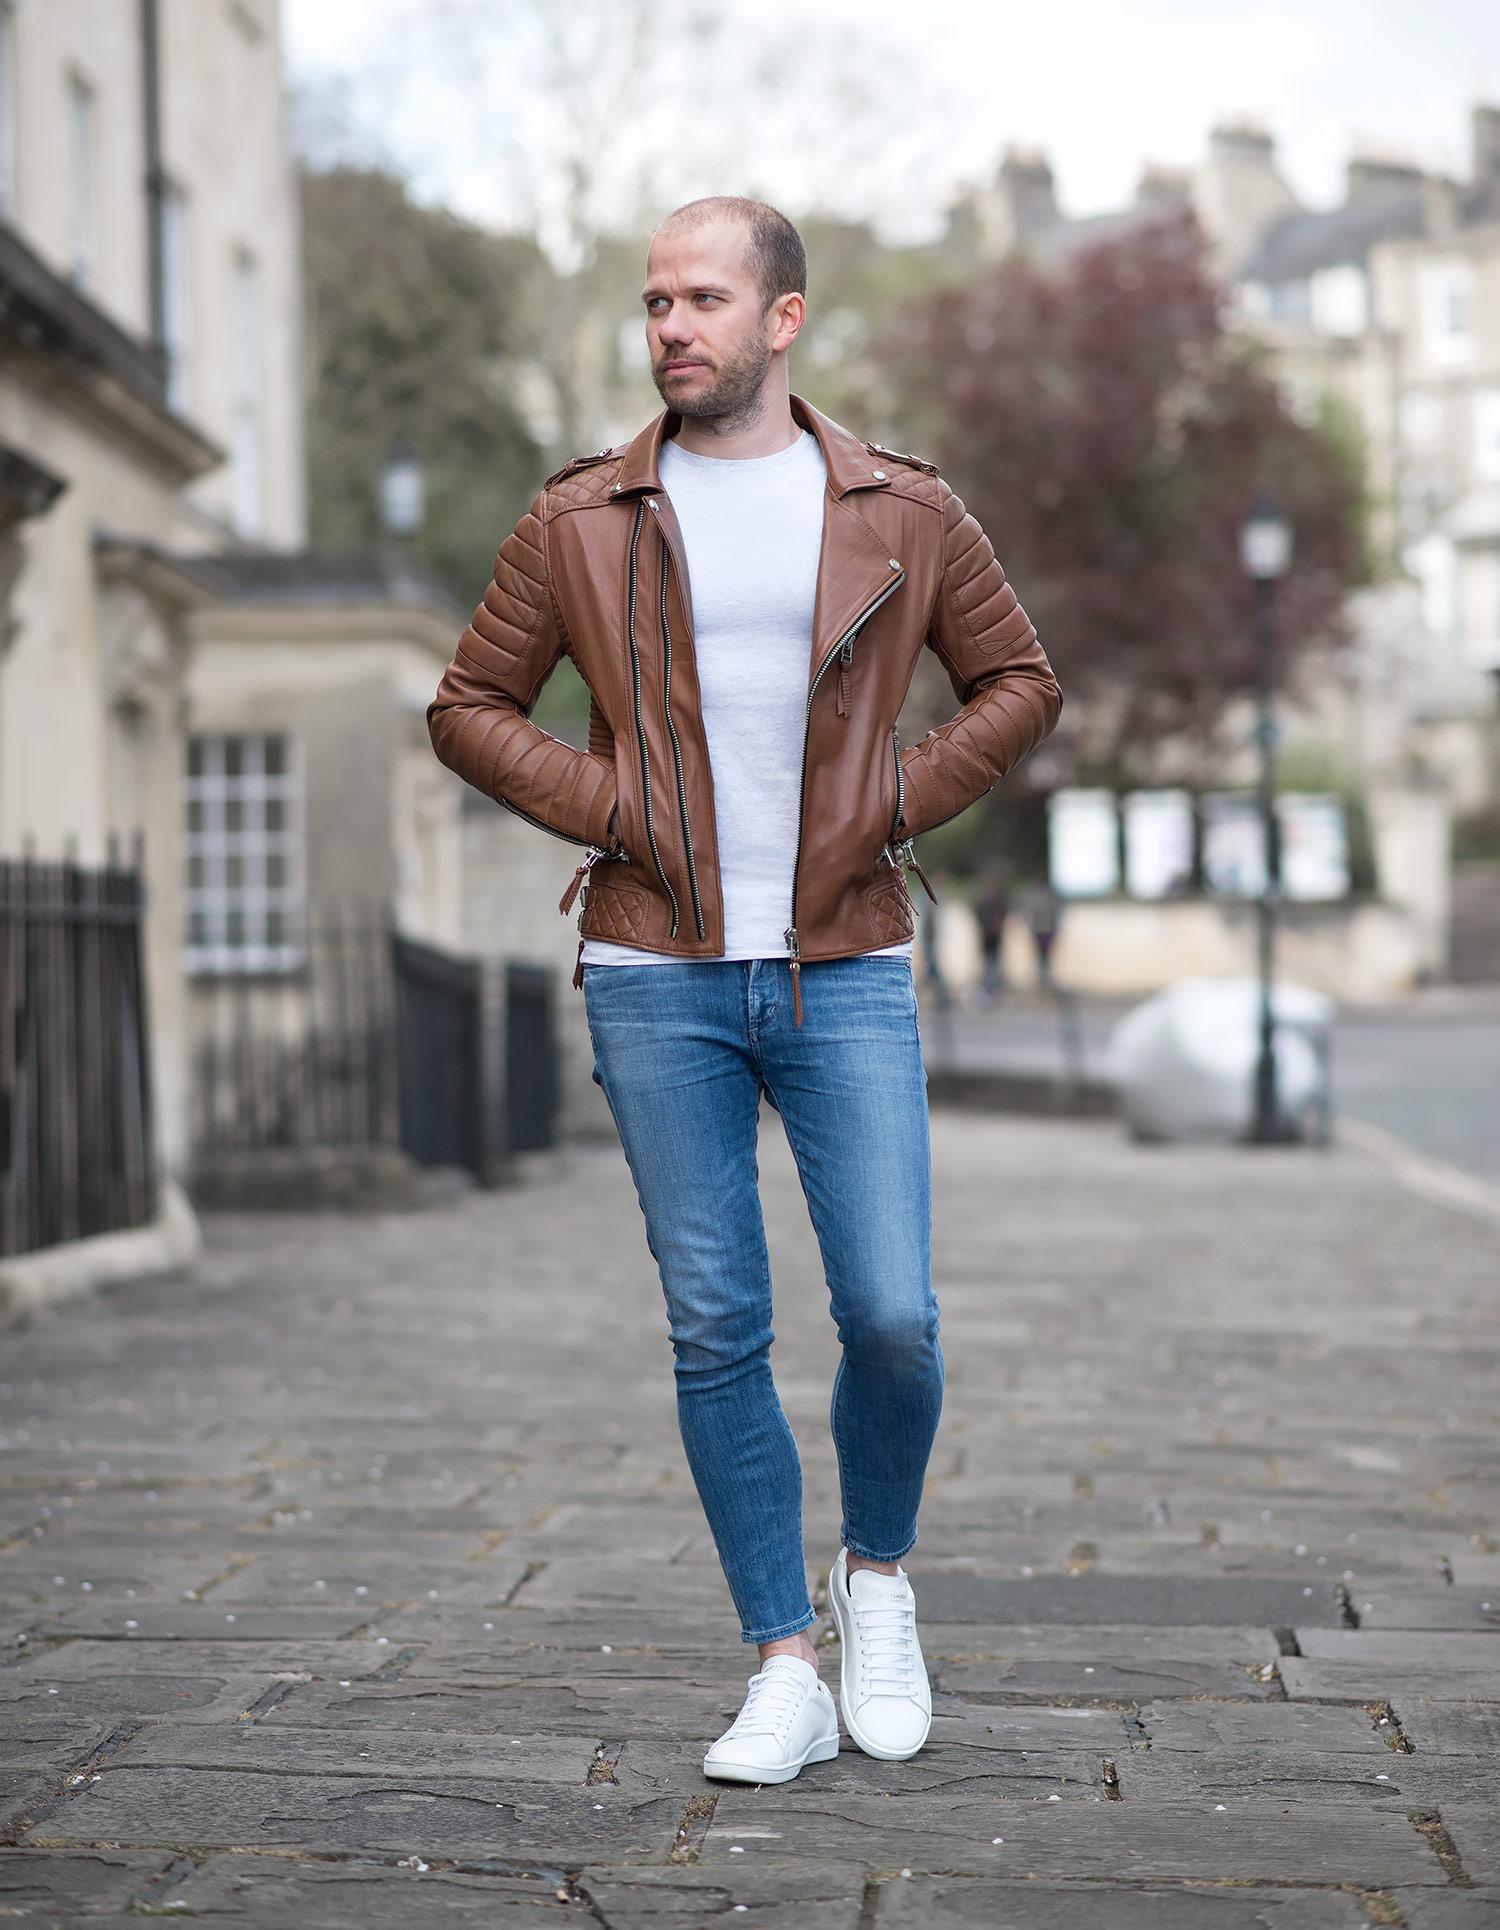 Leather biker jacket | Lederjacke männer, Street styles für